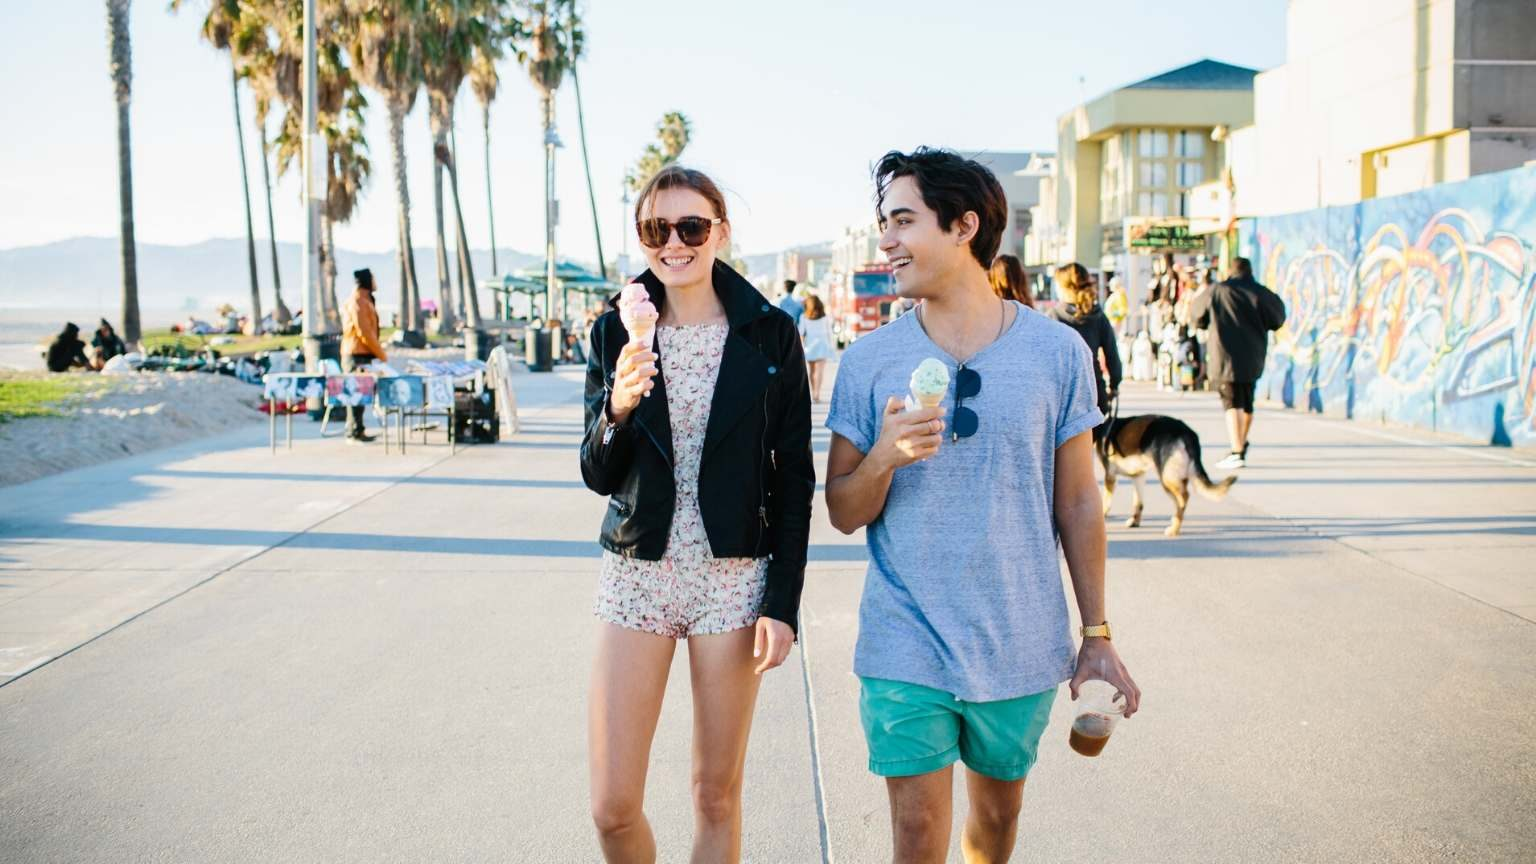 Young couple walking on the sidewalk eating icecream